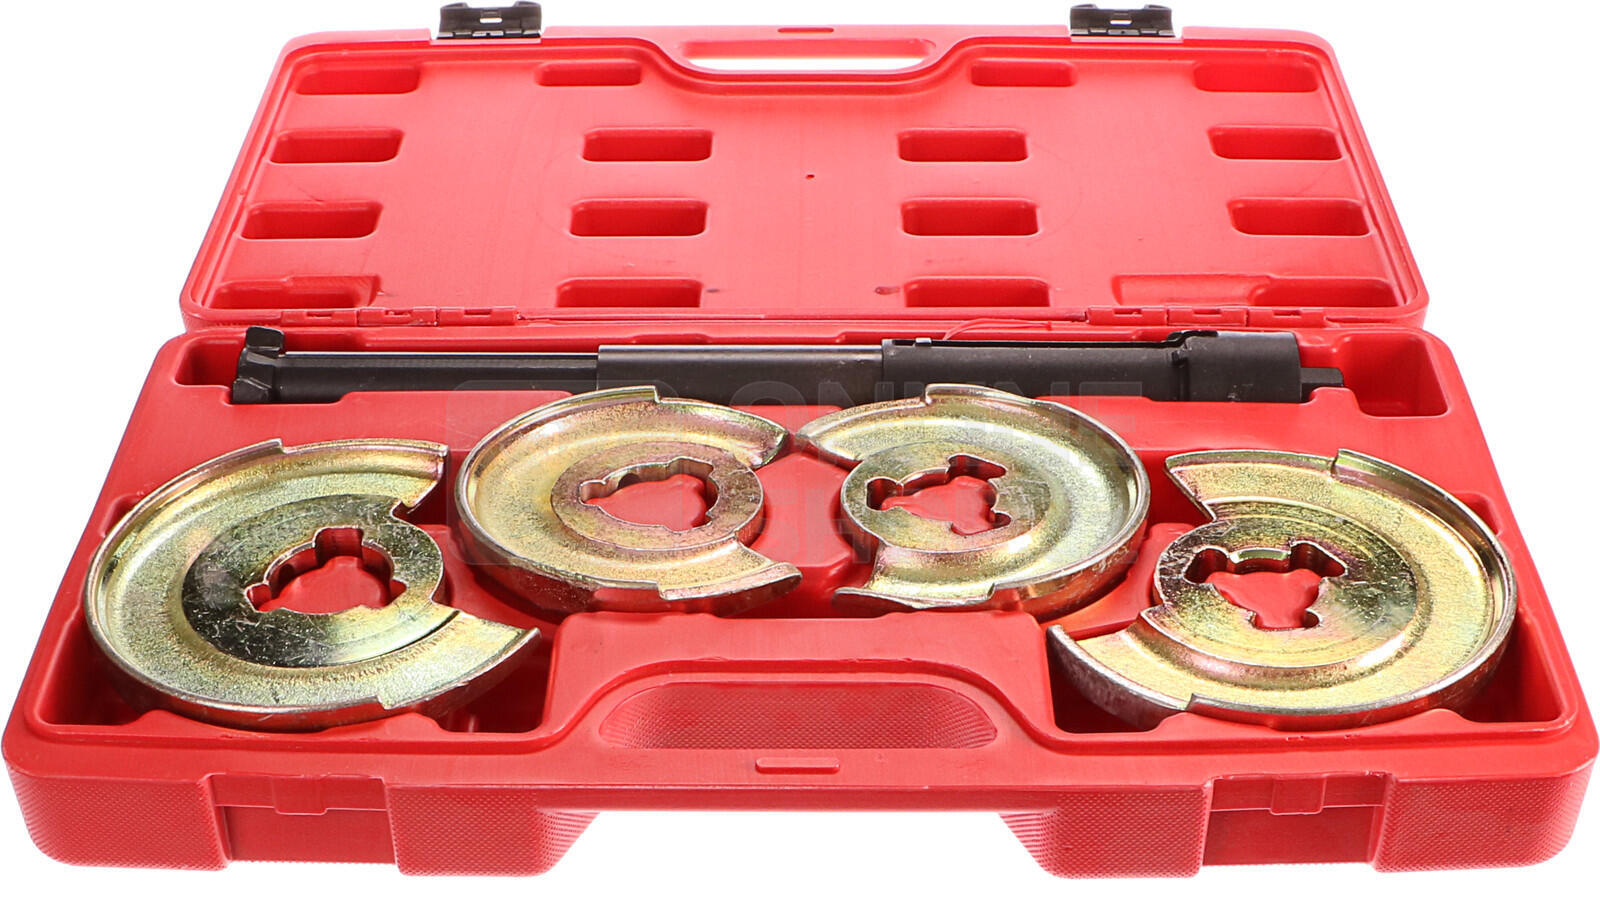 Stahovák pružin 120-325mm pro Mercedes-Benz, kufr GEKO